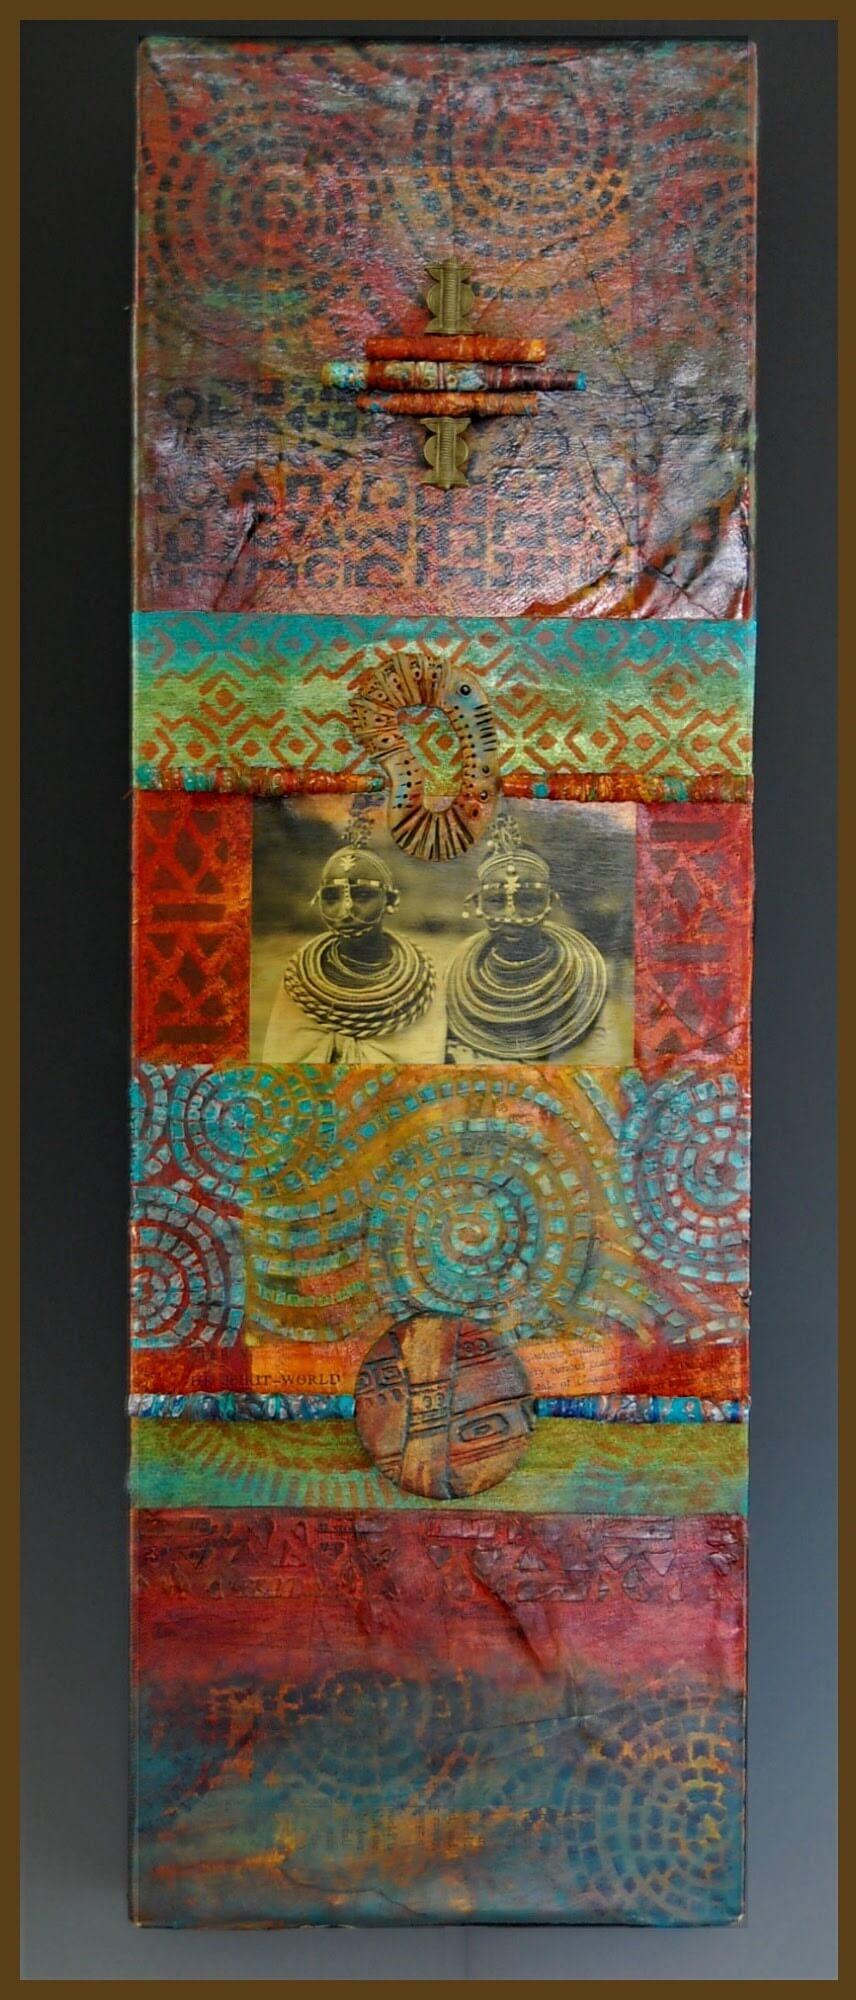 Michelle Davis Petelinz | Kindred Spirit Studios